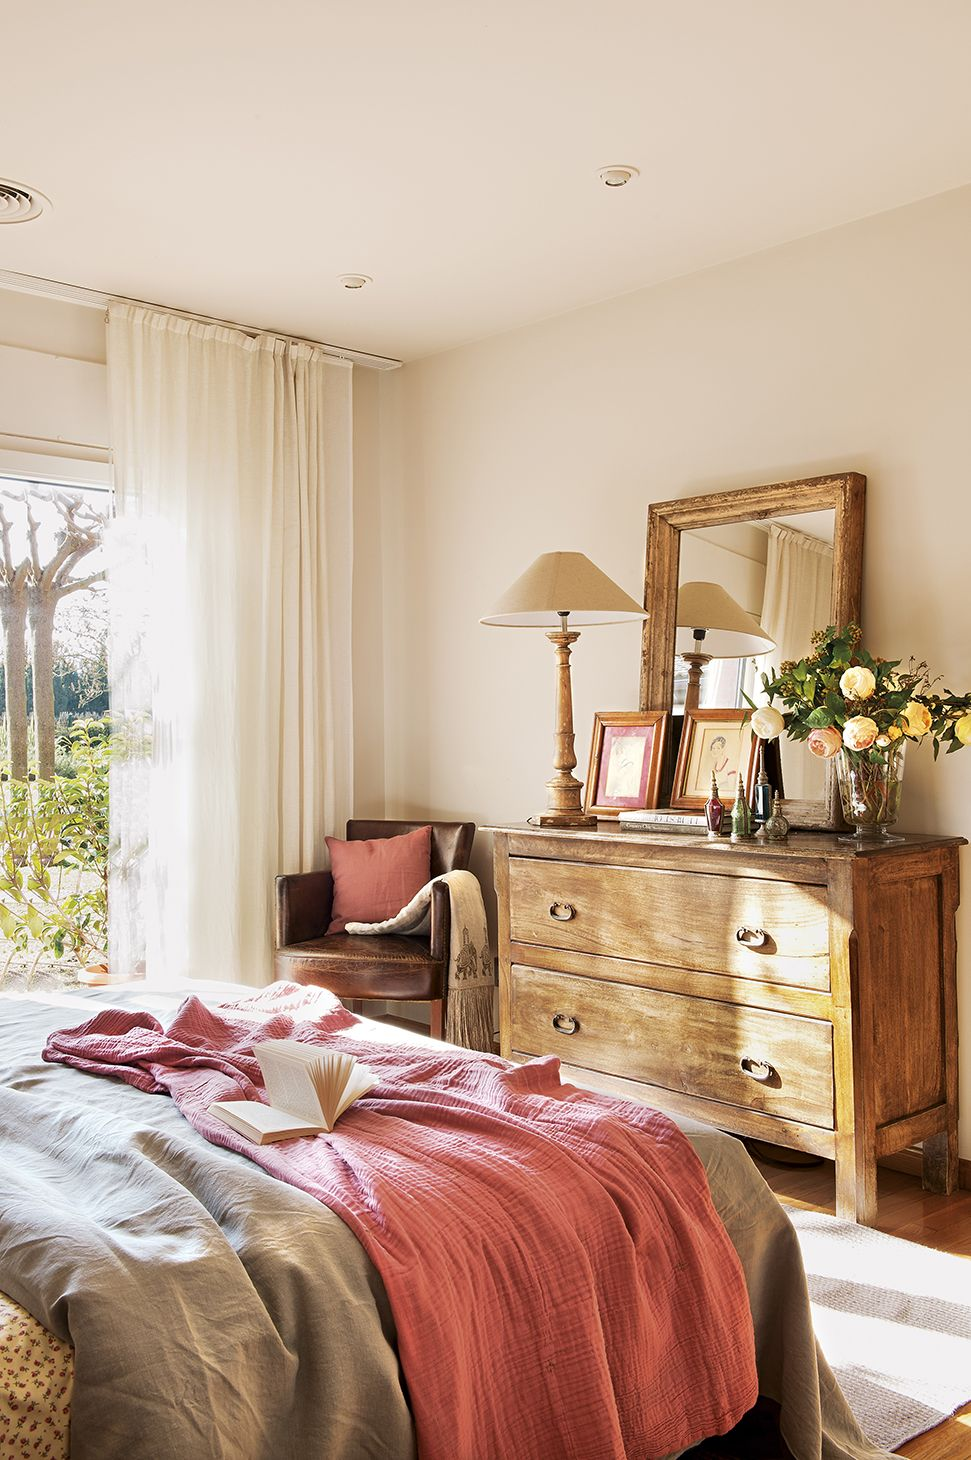 Dormitorio - mobiliario